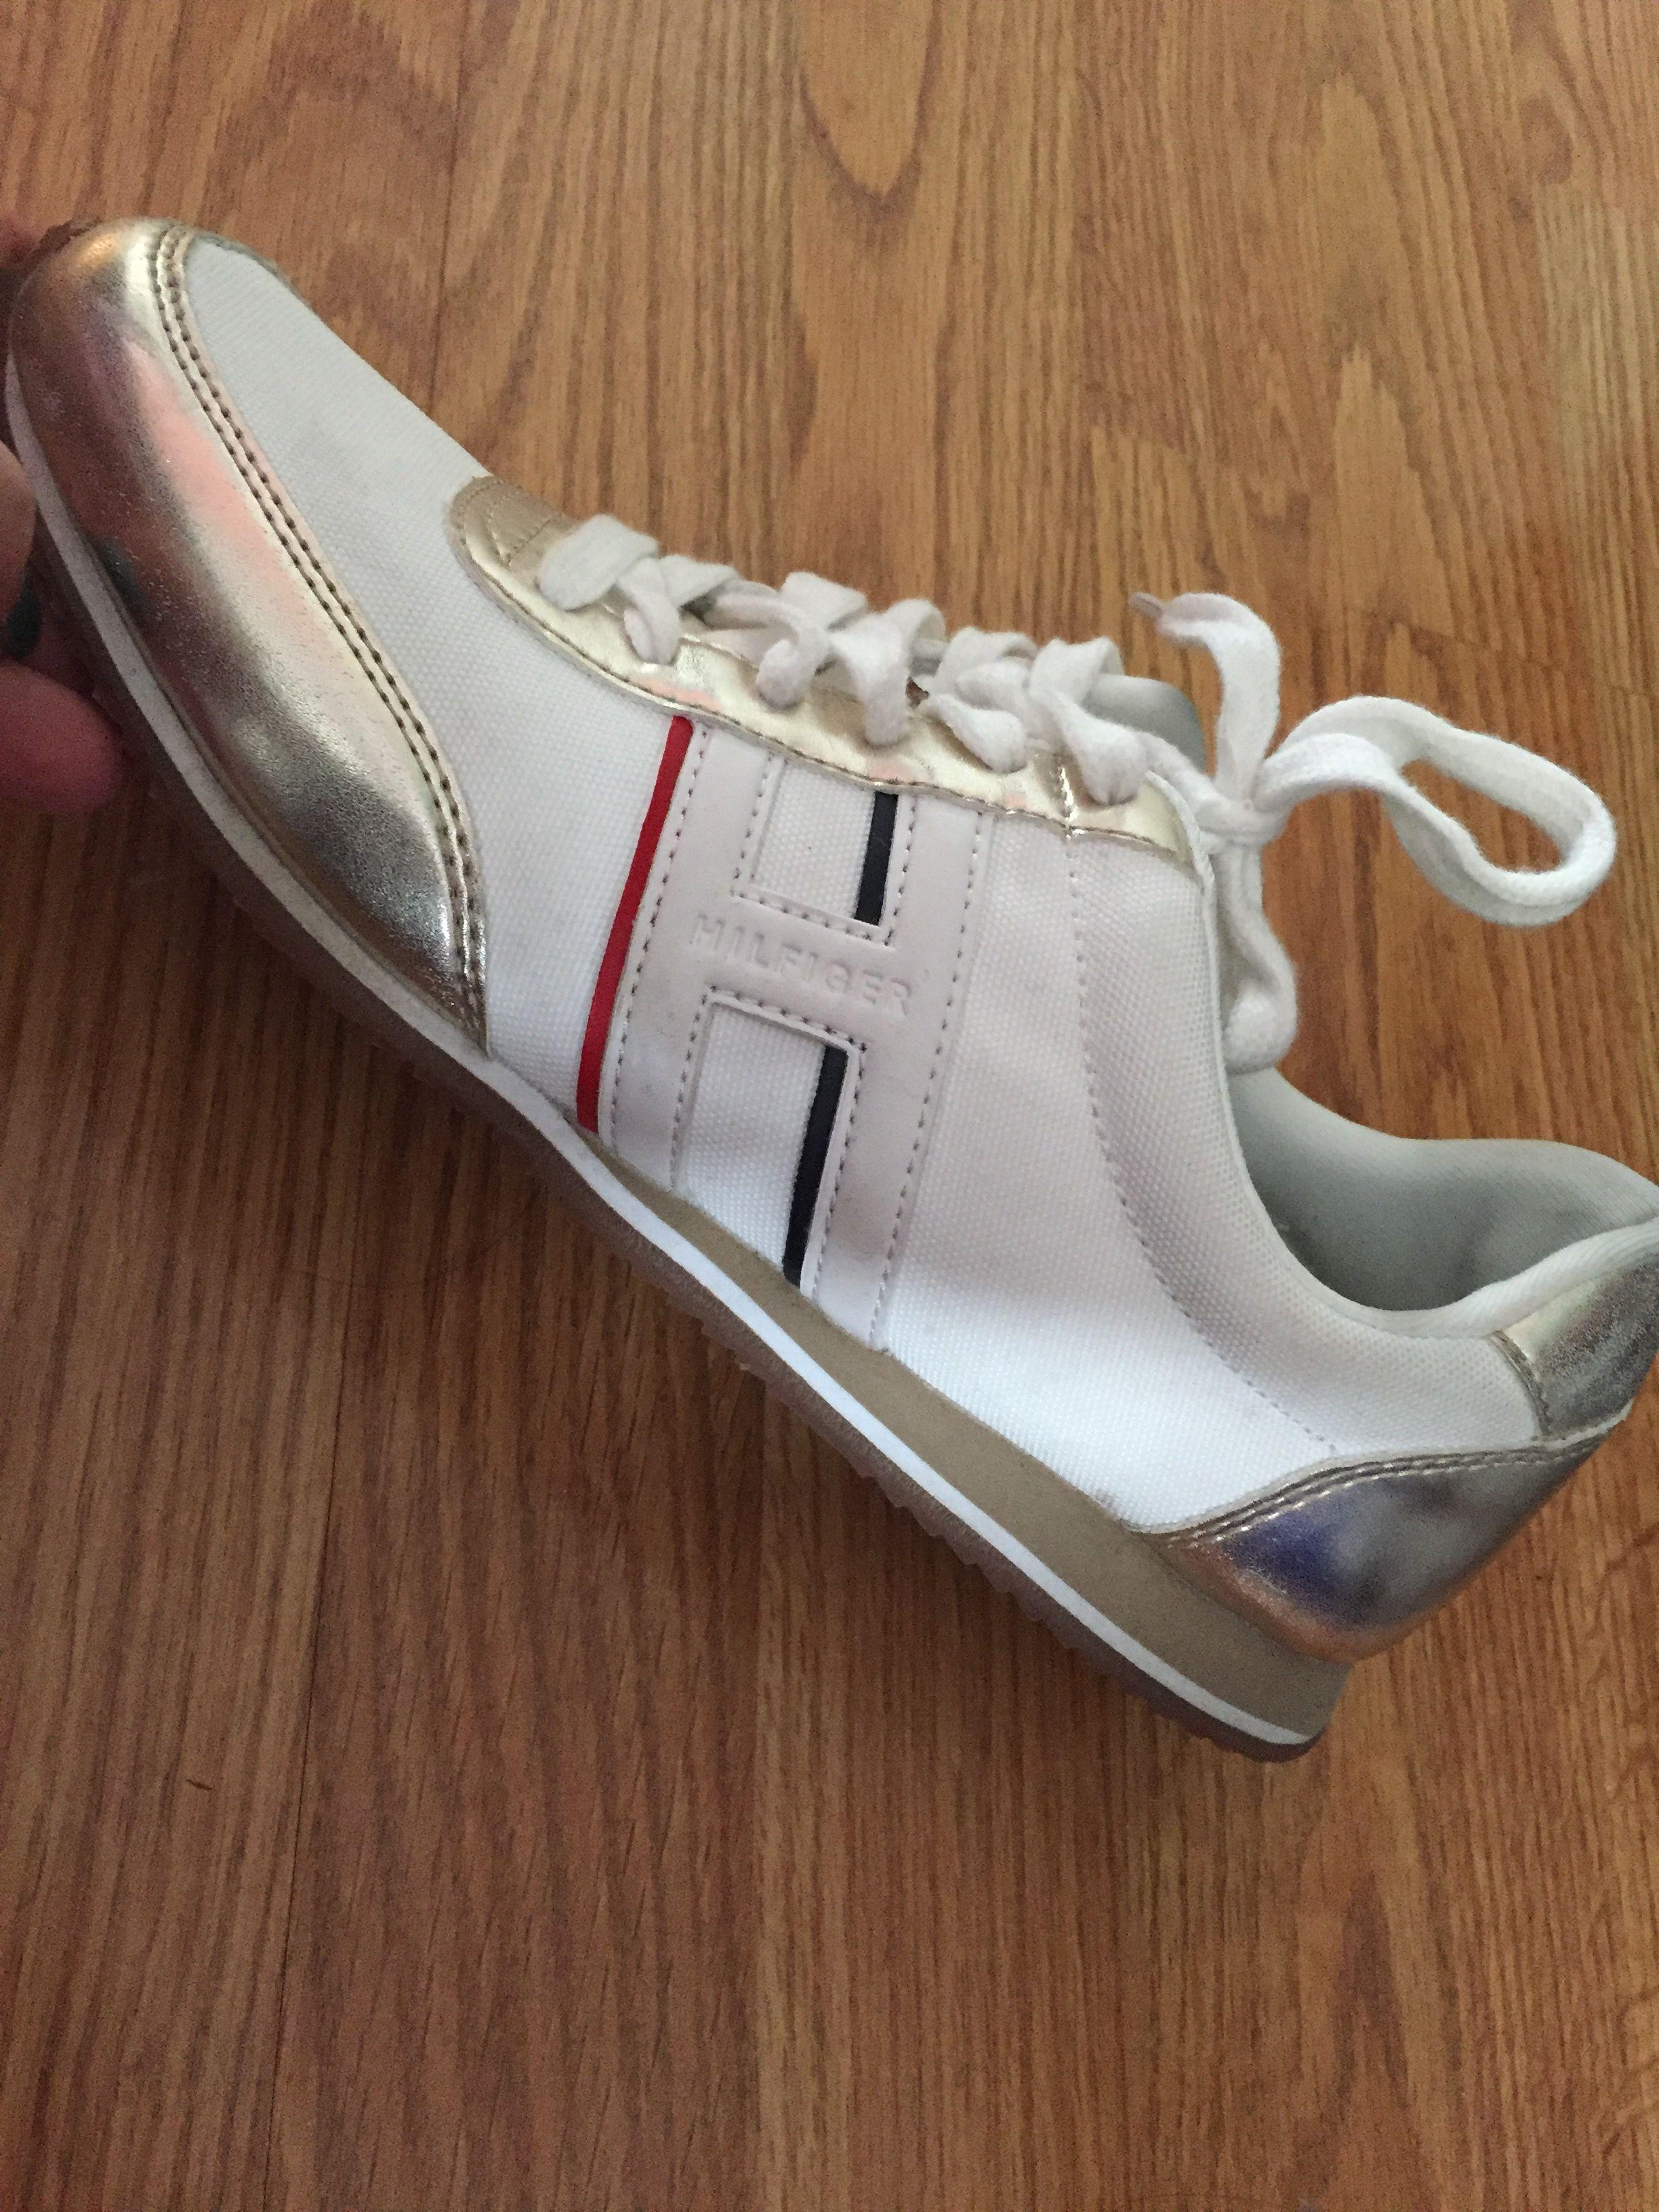 Zapatos Hilfiger blancos mujer